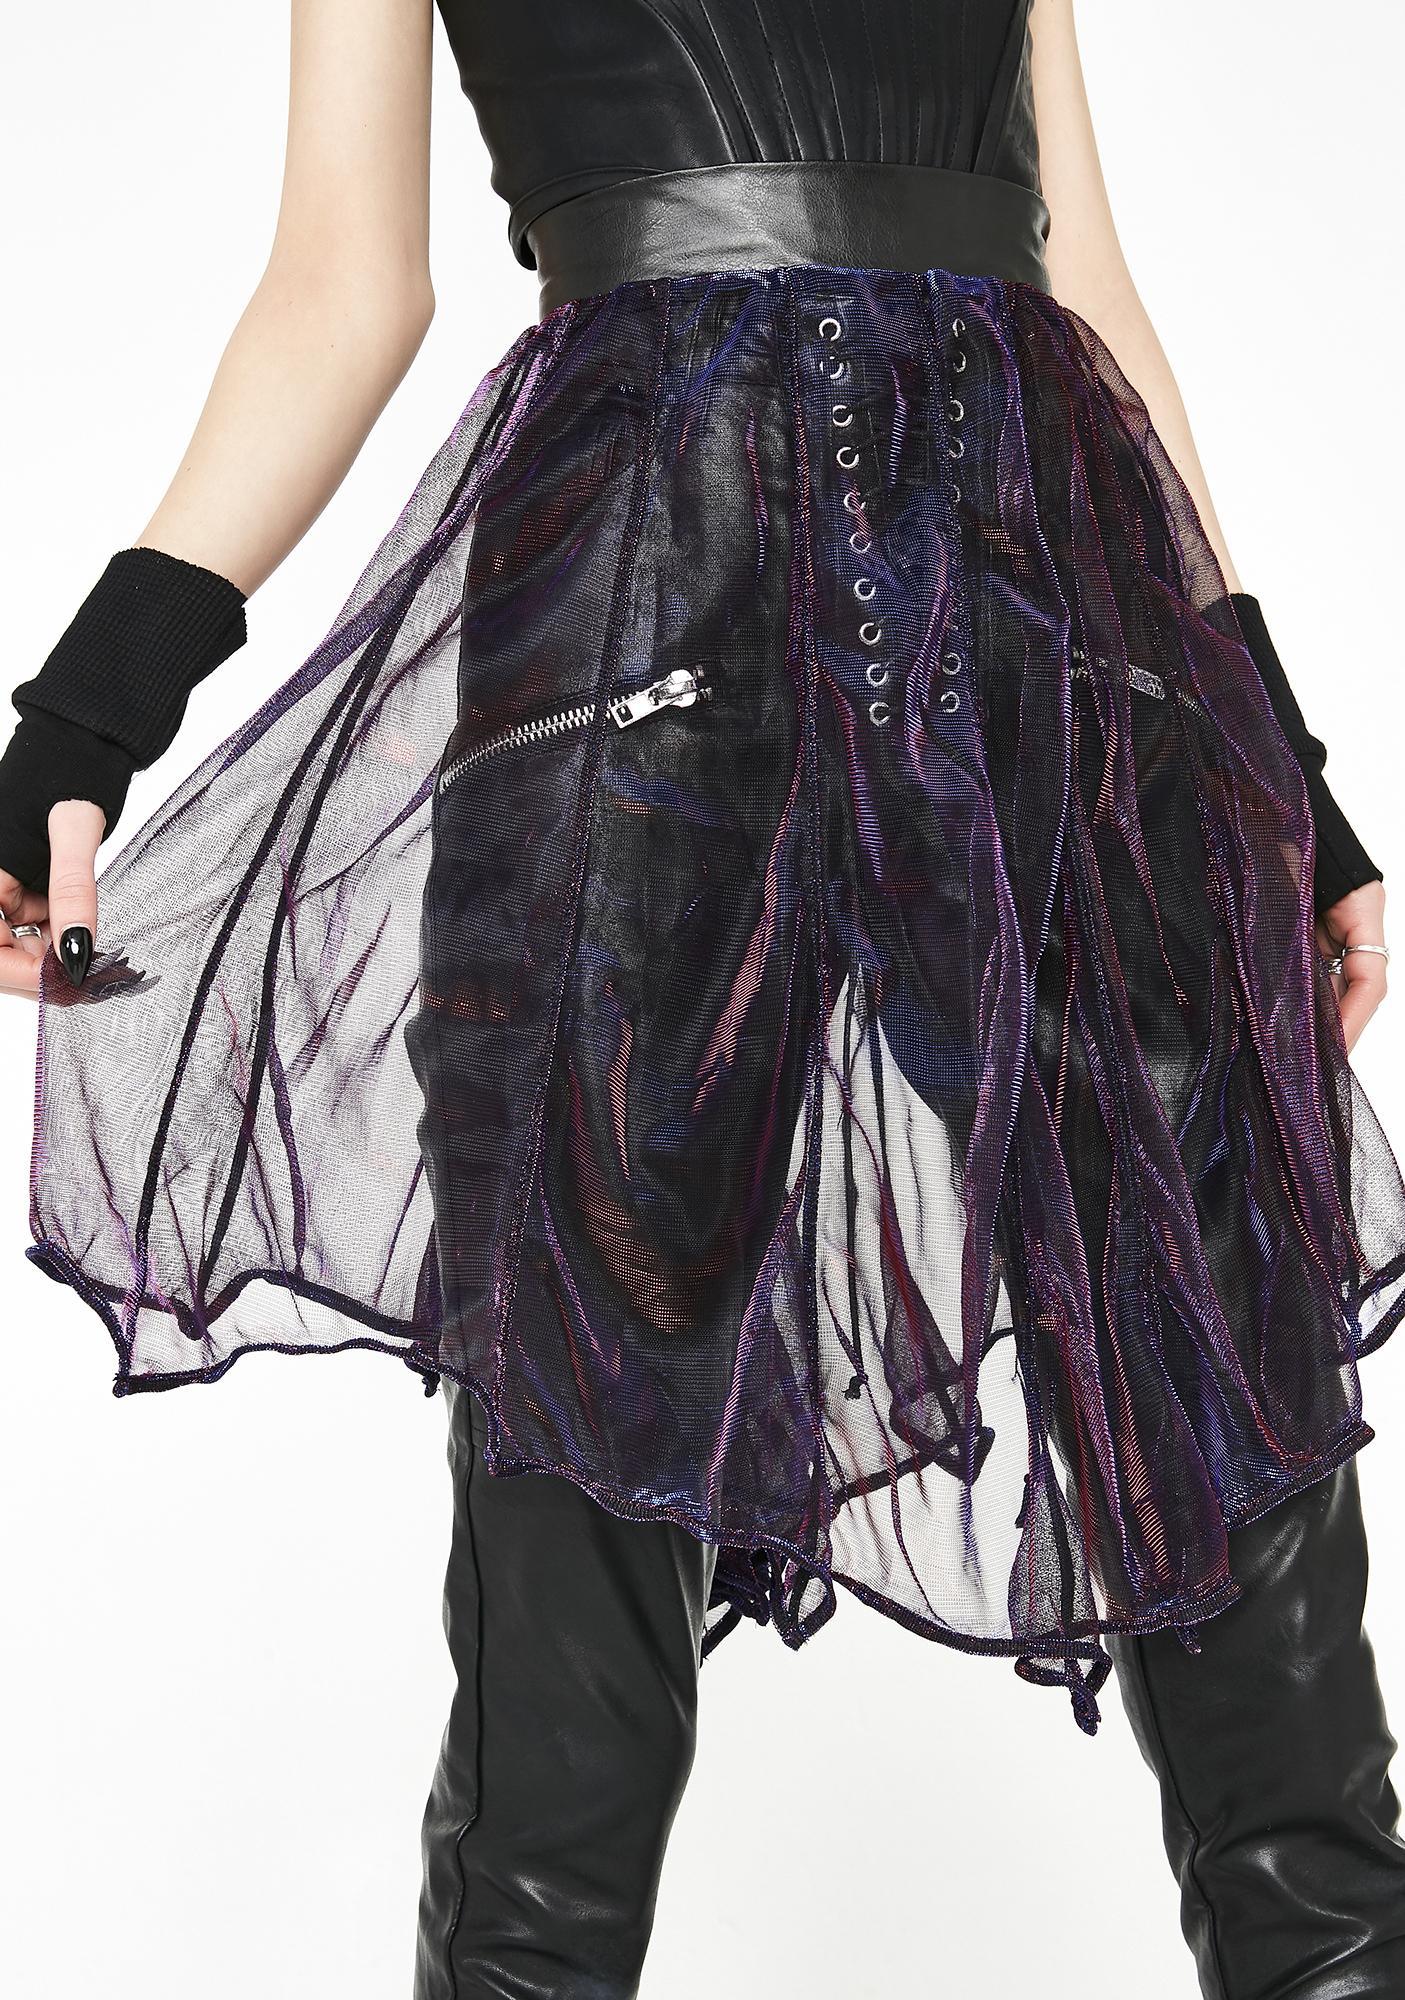 Necessary Evil Minyades Iridescent Bat Skirt